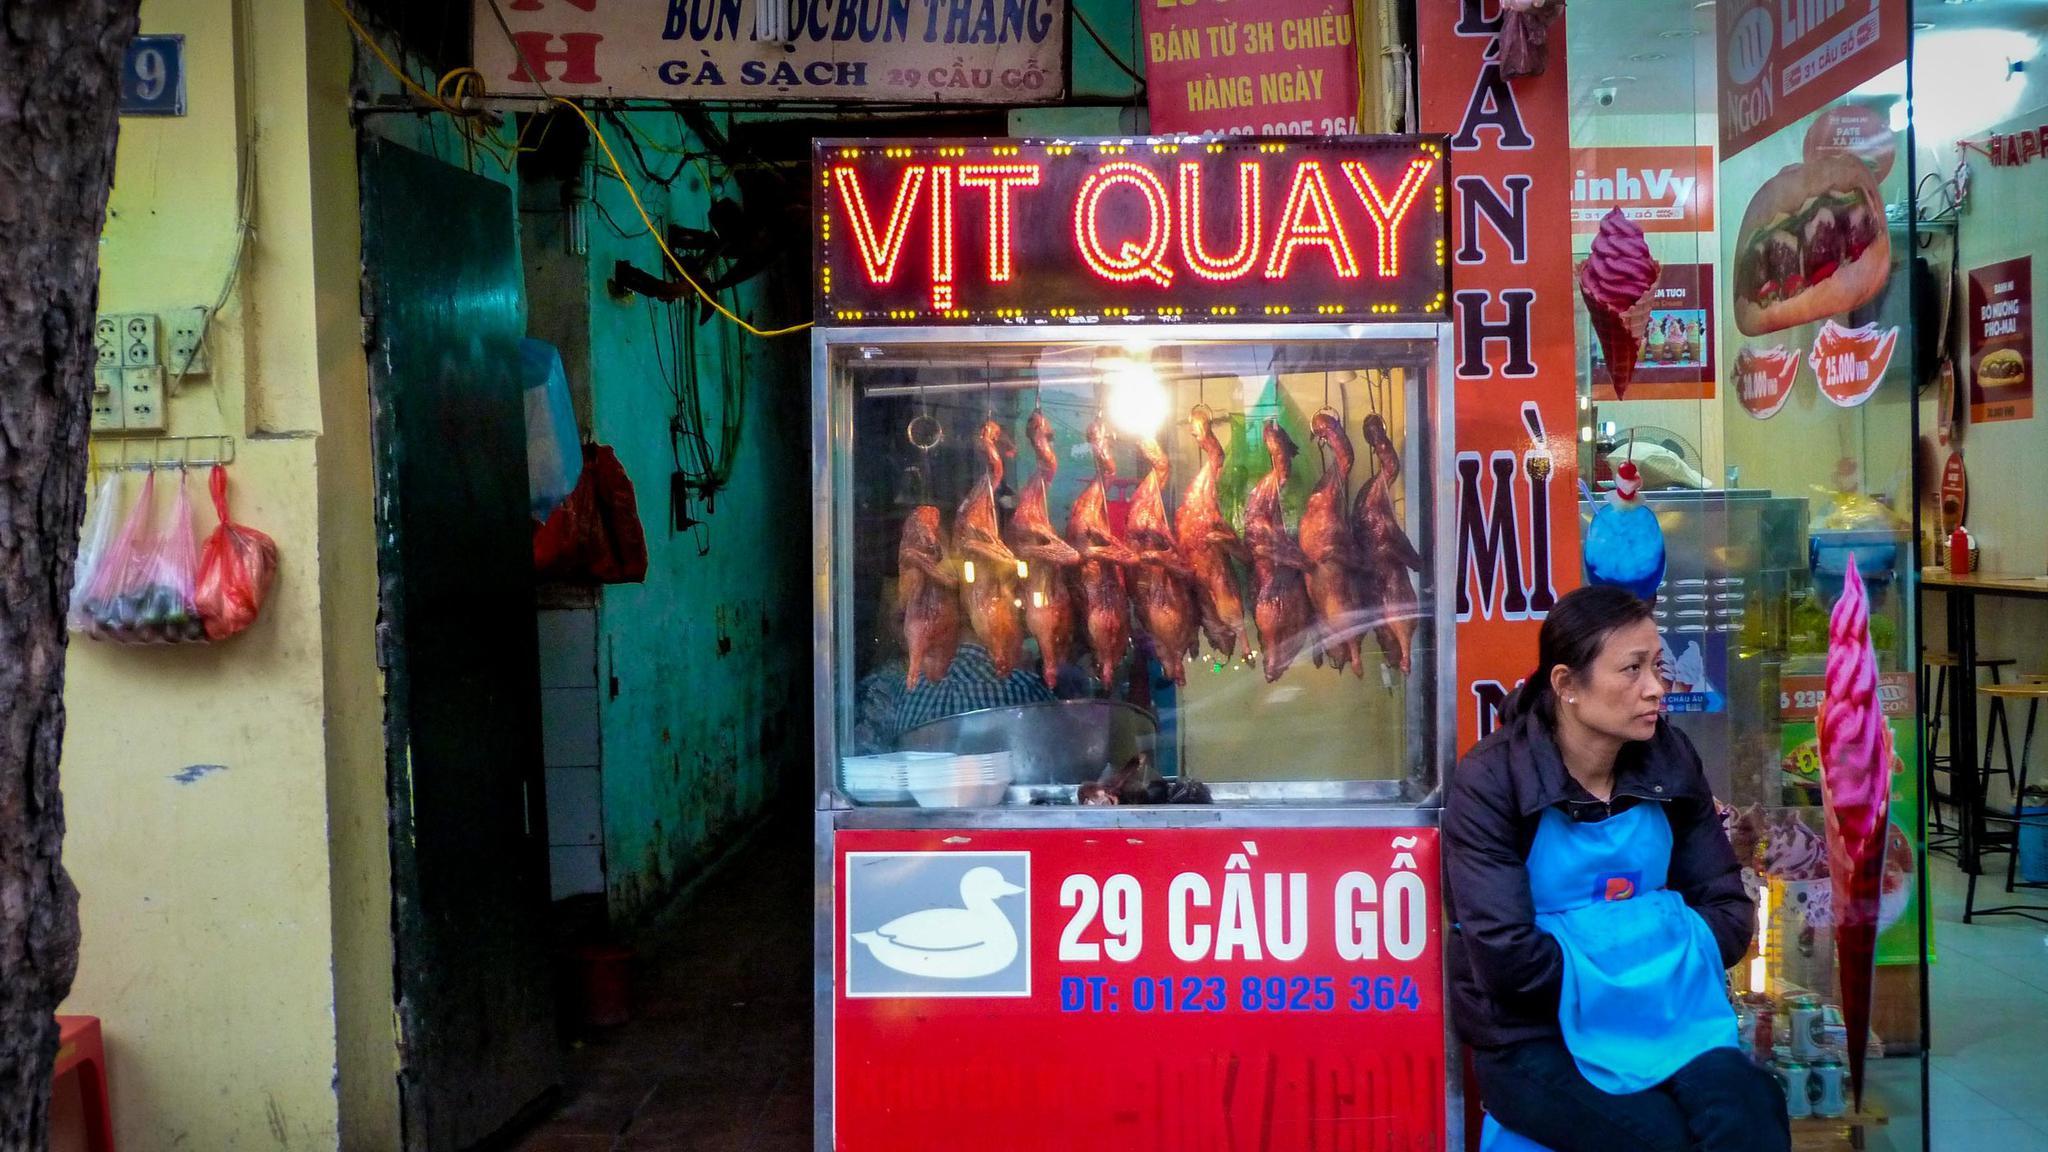 Ha Noi street food vendor